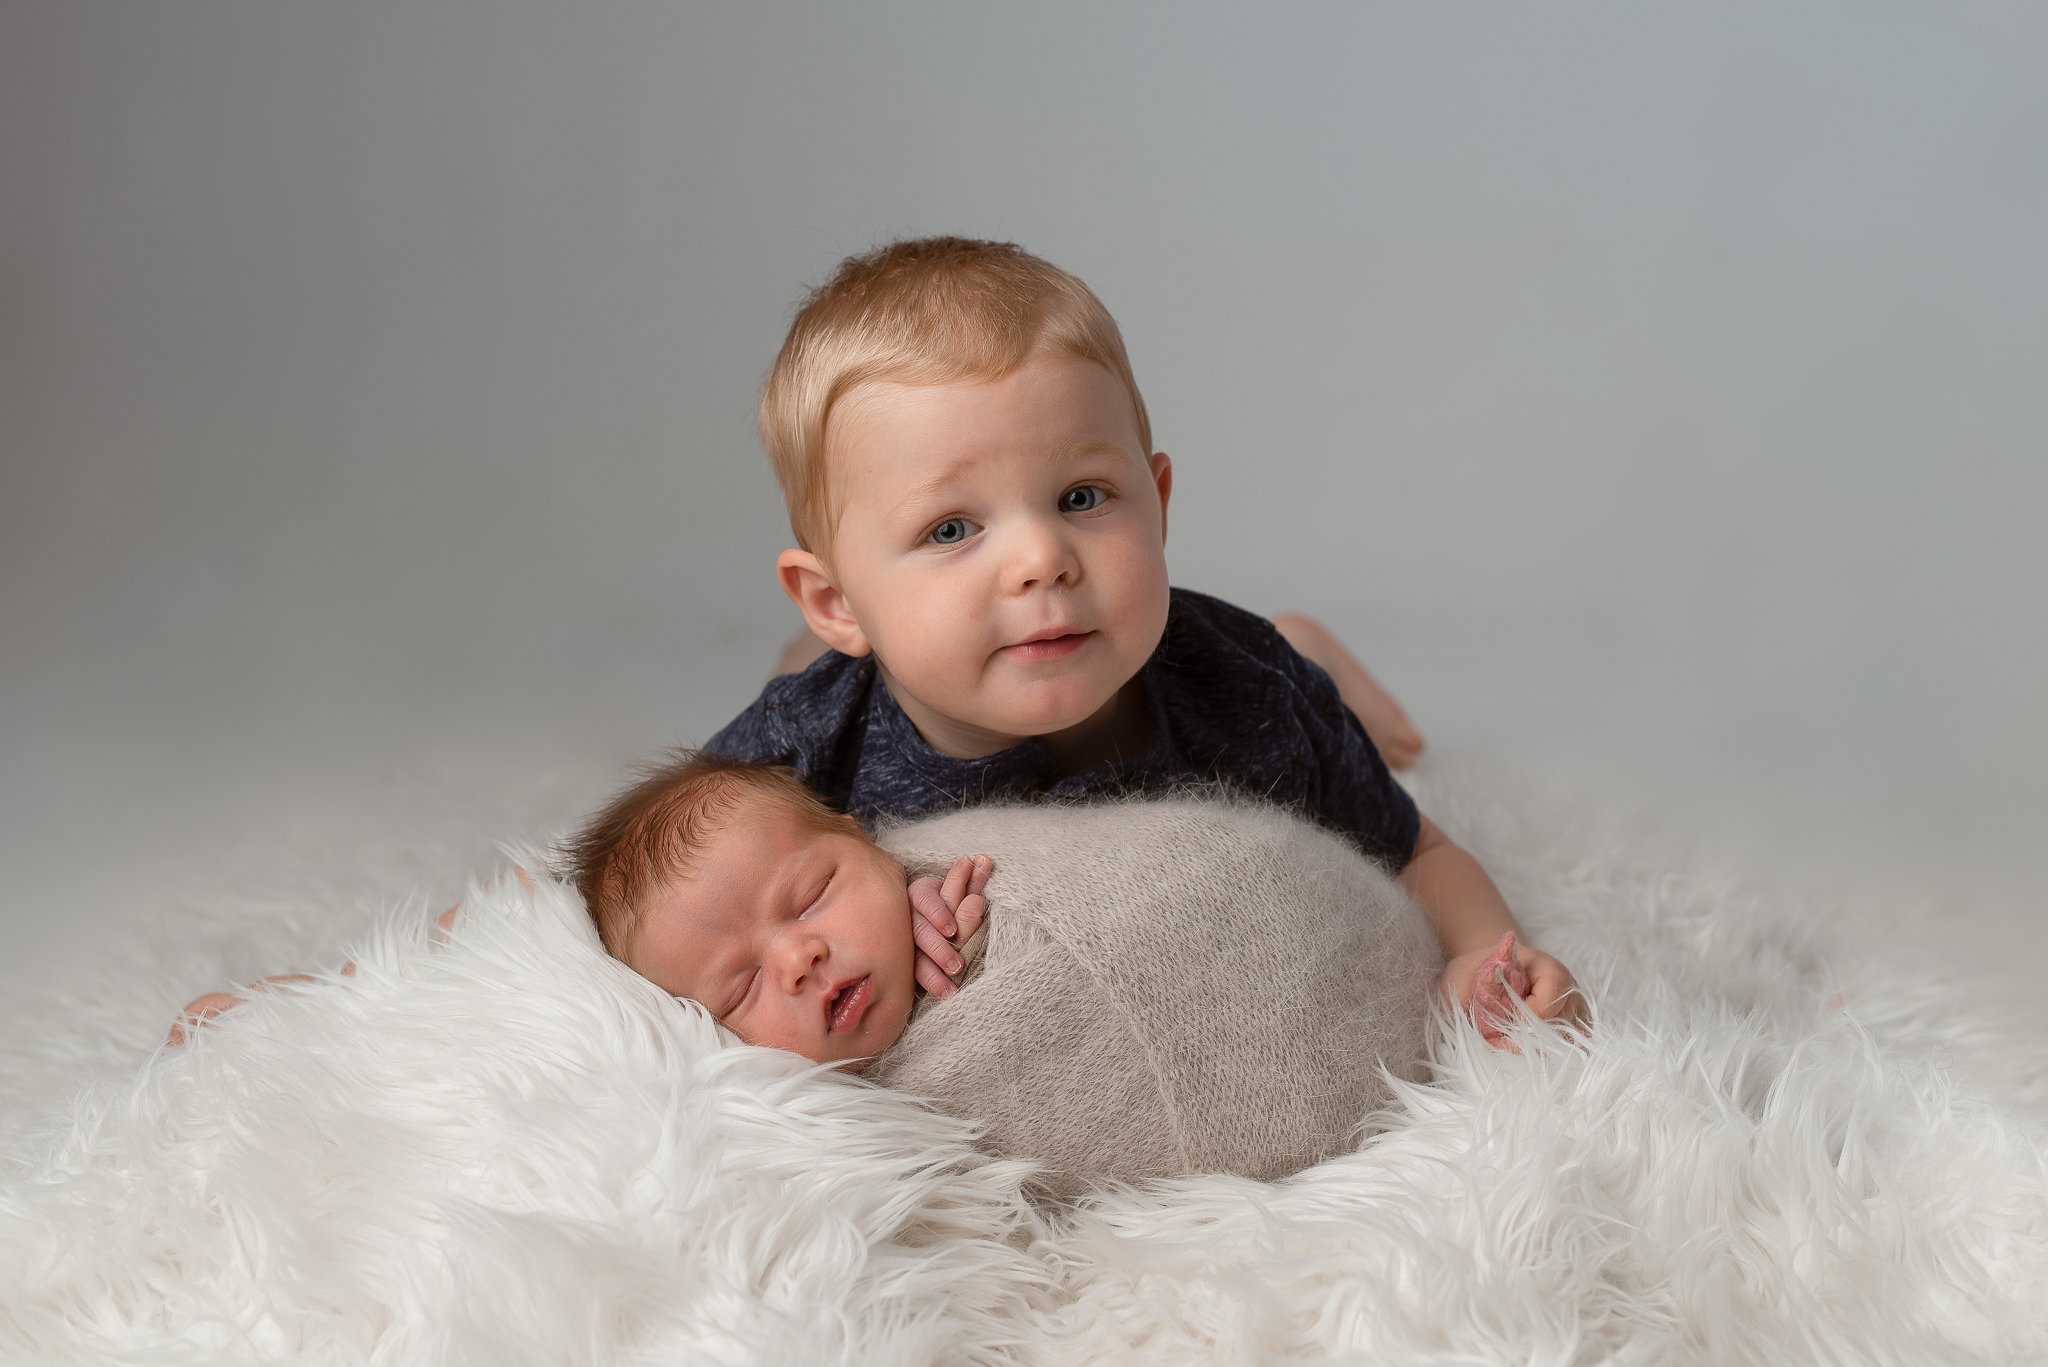 Newborn140NaomiLuciennePhotography062019-Edit-2.jpg